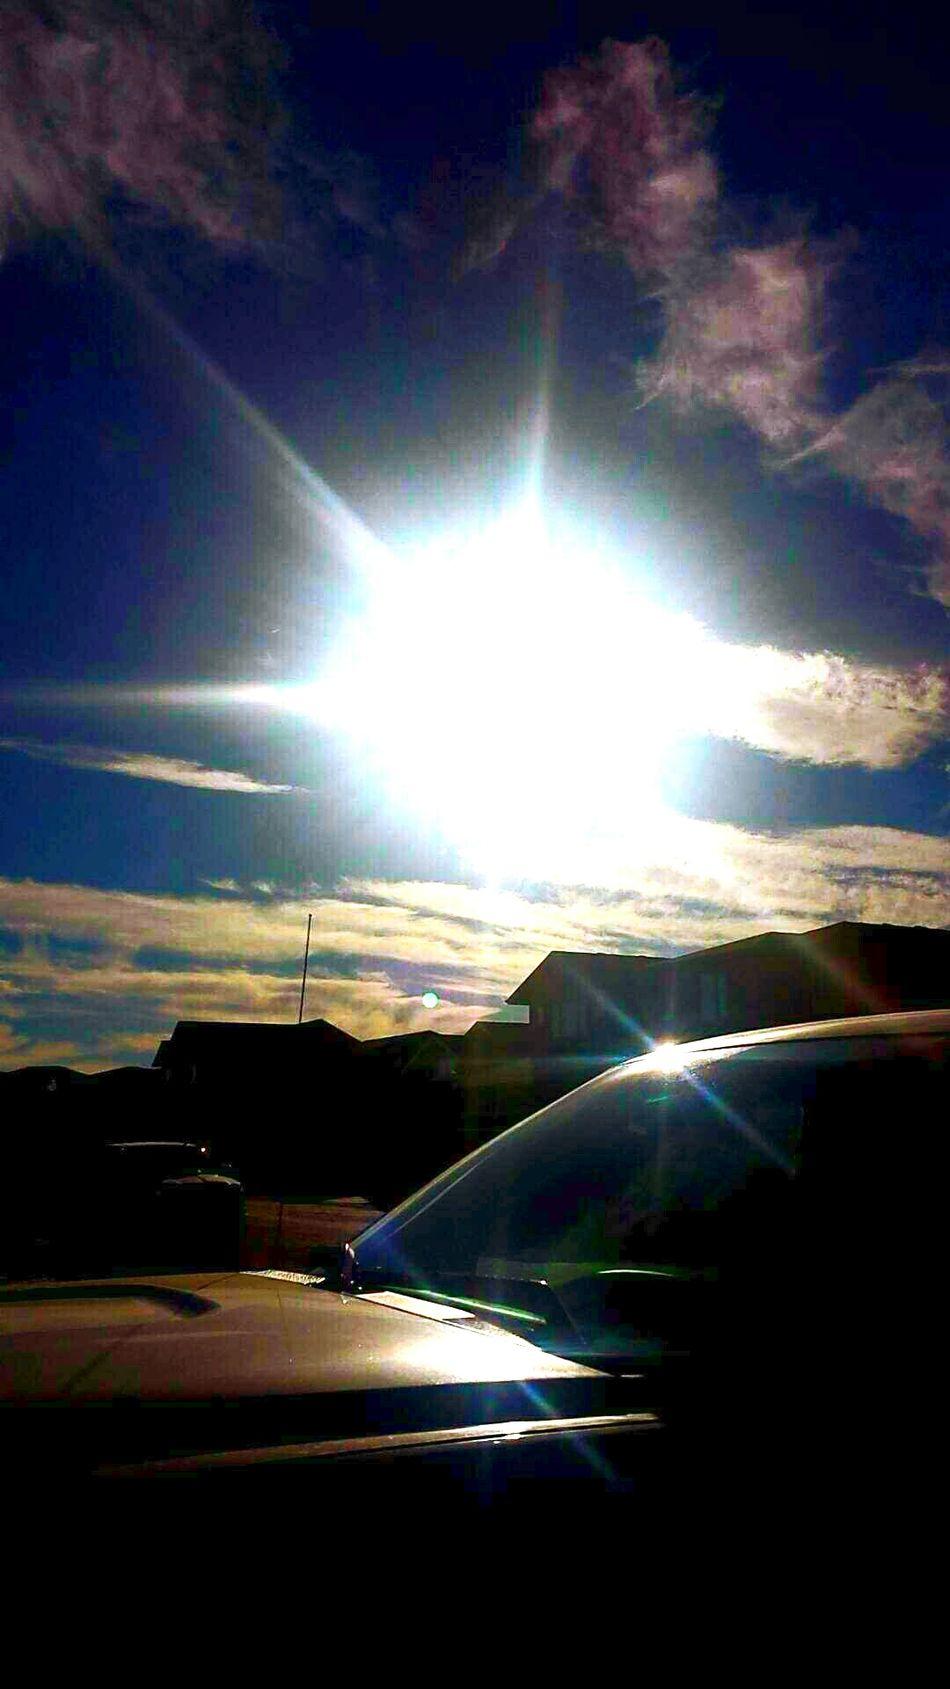 Sunny Day Sunny Afternoon Sun_collection Sunlight Sunnyday Sky And Clouds Skysunvariation Sunsky Sunandclouds Sunandlove Sunview Sunnysideoflife Sunny Morning Sunny Winter Day Sunny Day 🌞 Sunny Sunday Overeditedonsunnytram Alleycat #orbs #cats #sunnymorning #sunshine Sunshine Gladitssunny